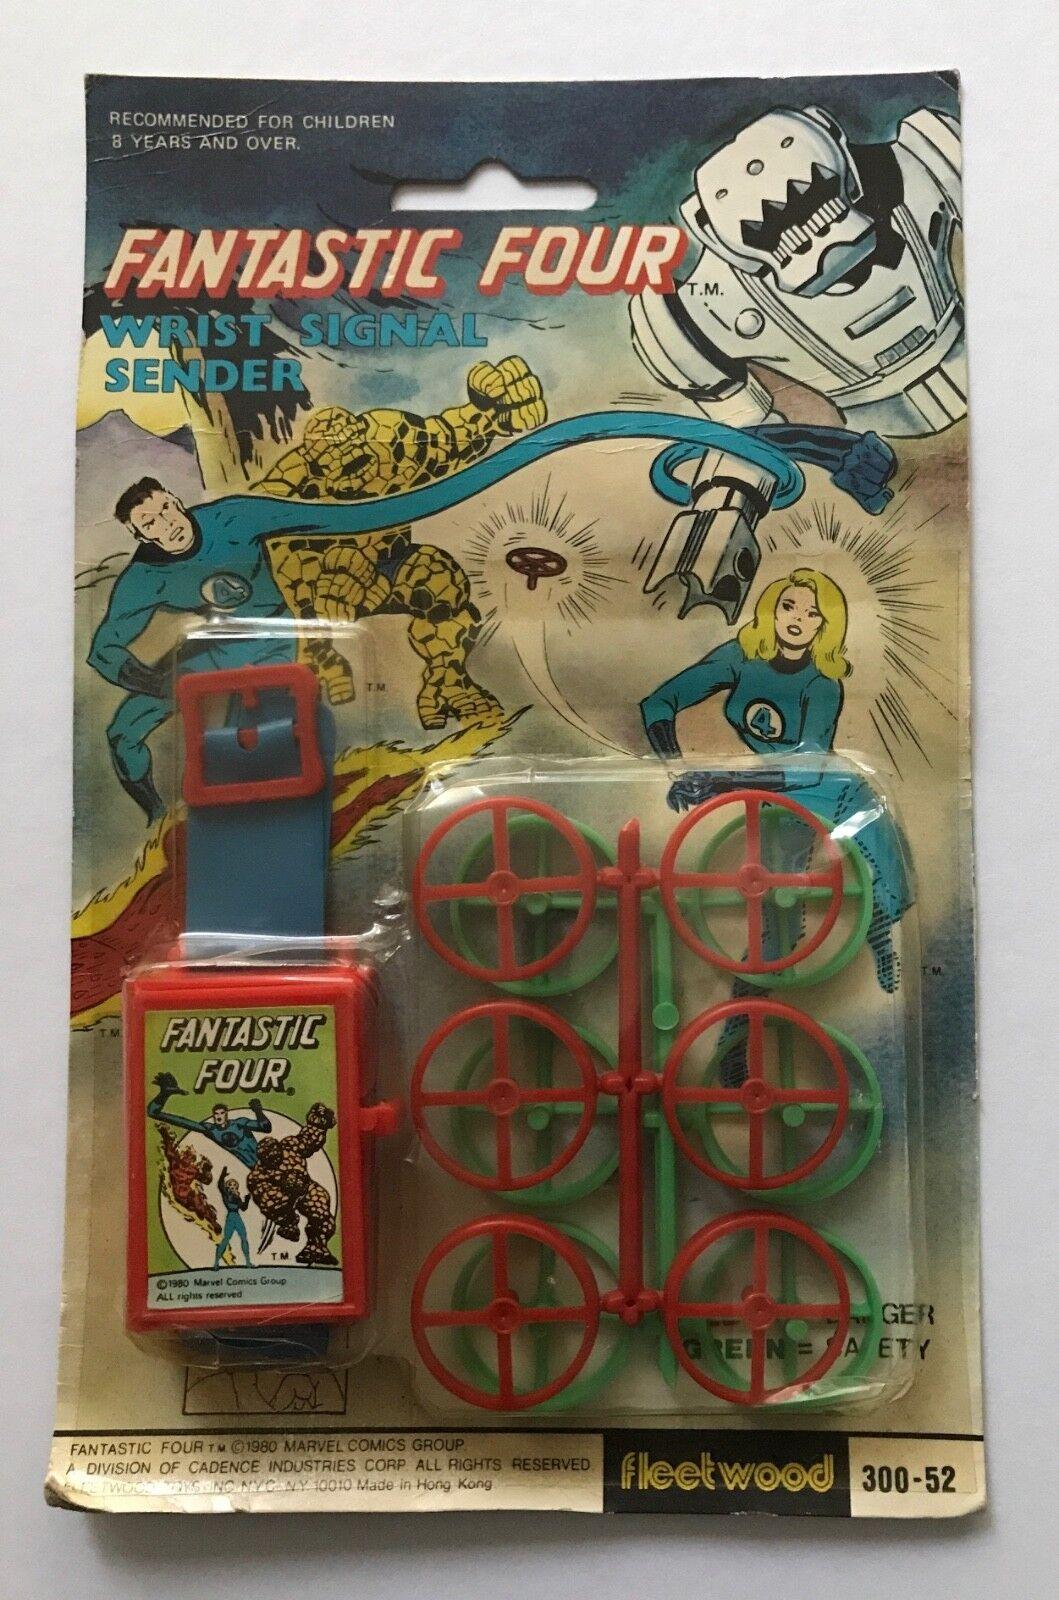 Vintage 1980 FLEETWOOD Fantastic Four Wrist Signal Sender MOC  Rare